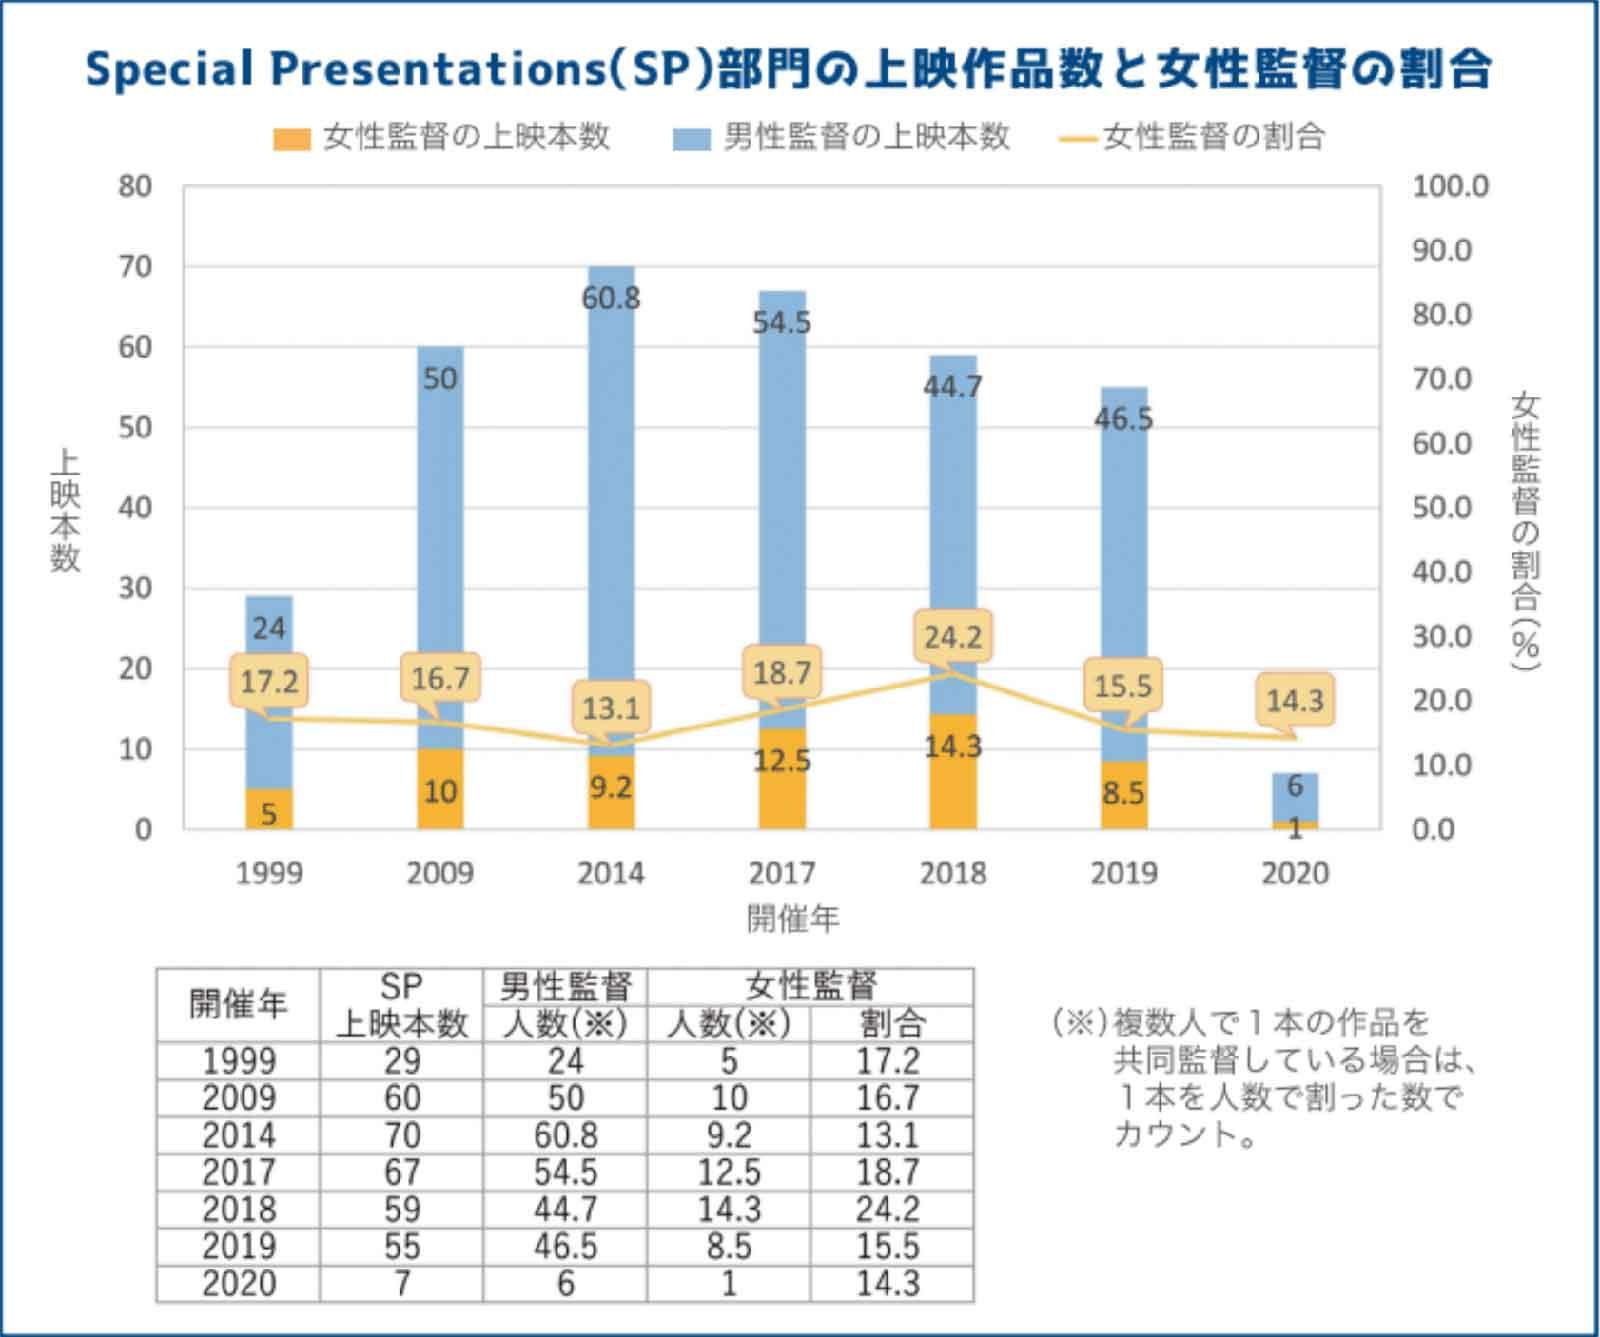 Special Presentations(SP)部門の上映作品数と女性監督の割合